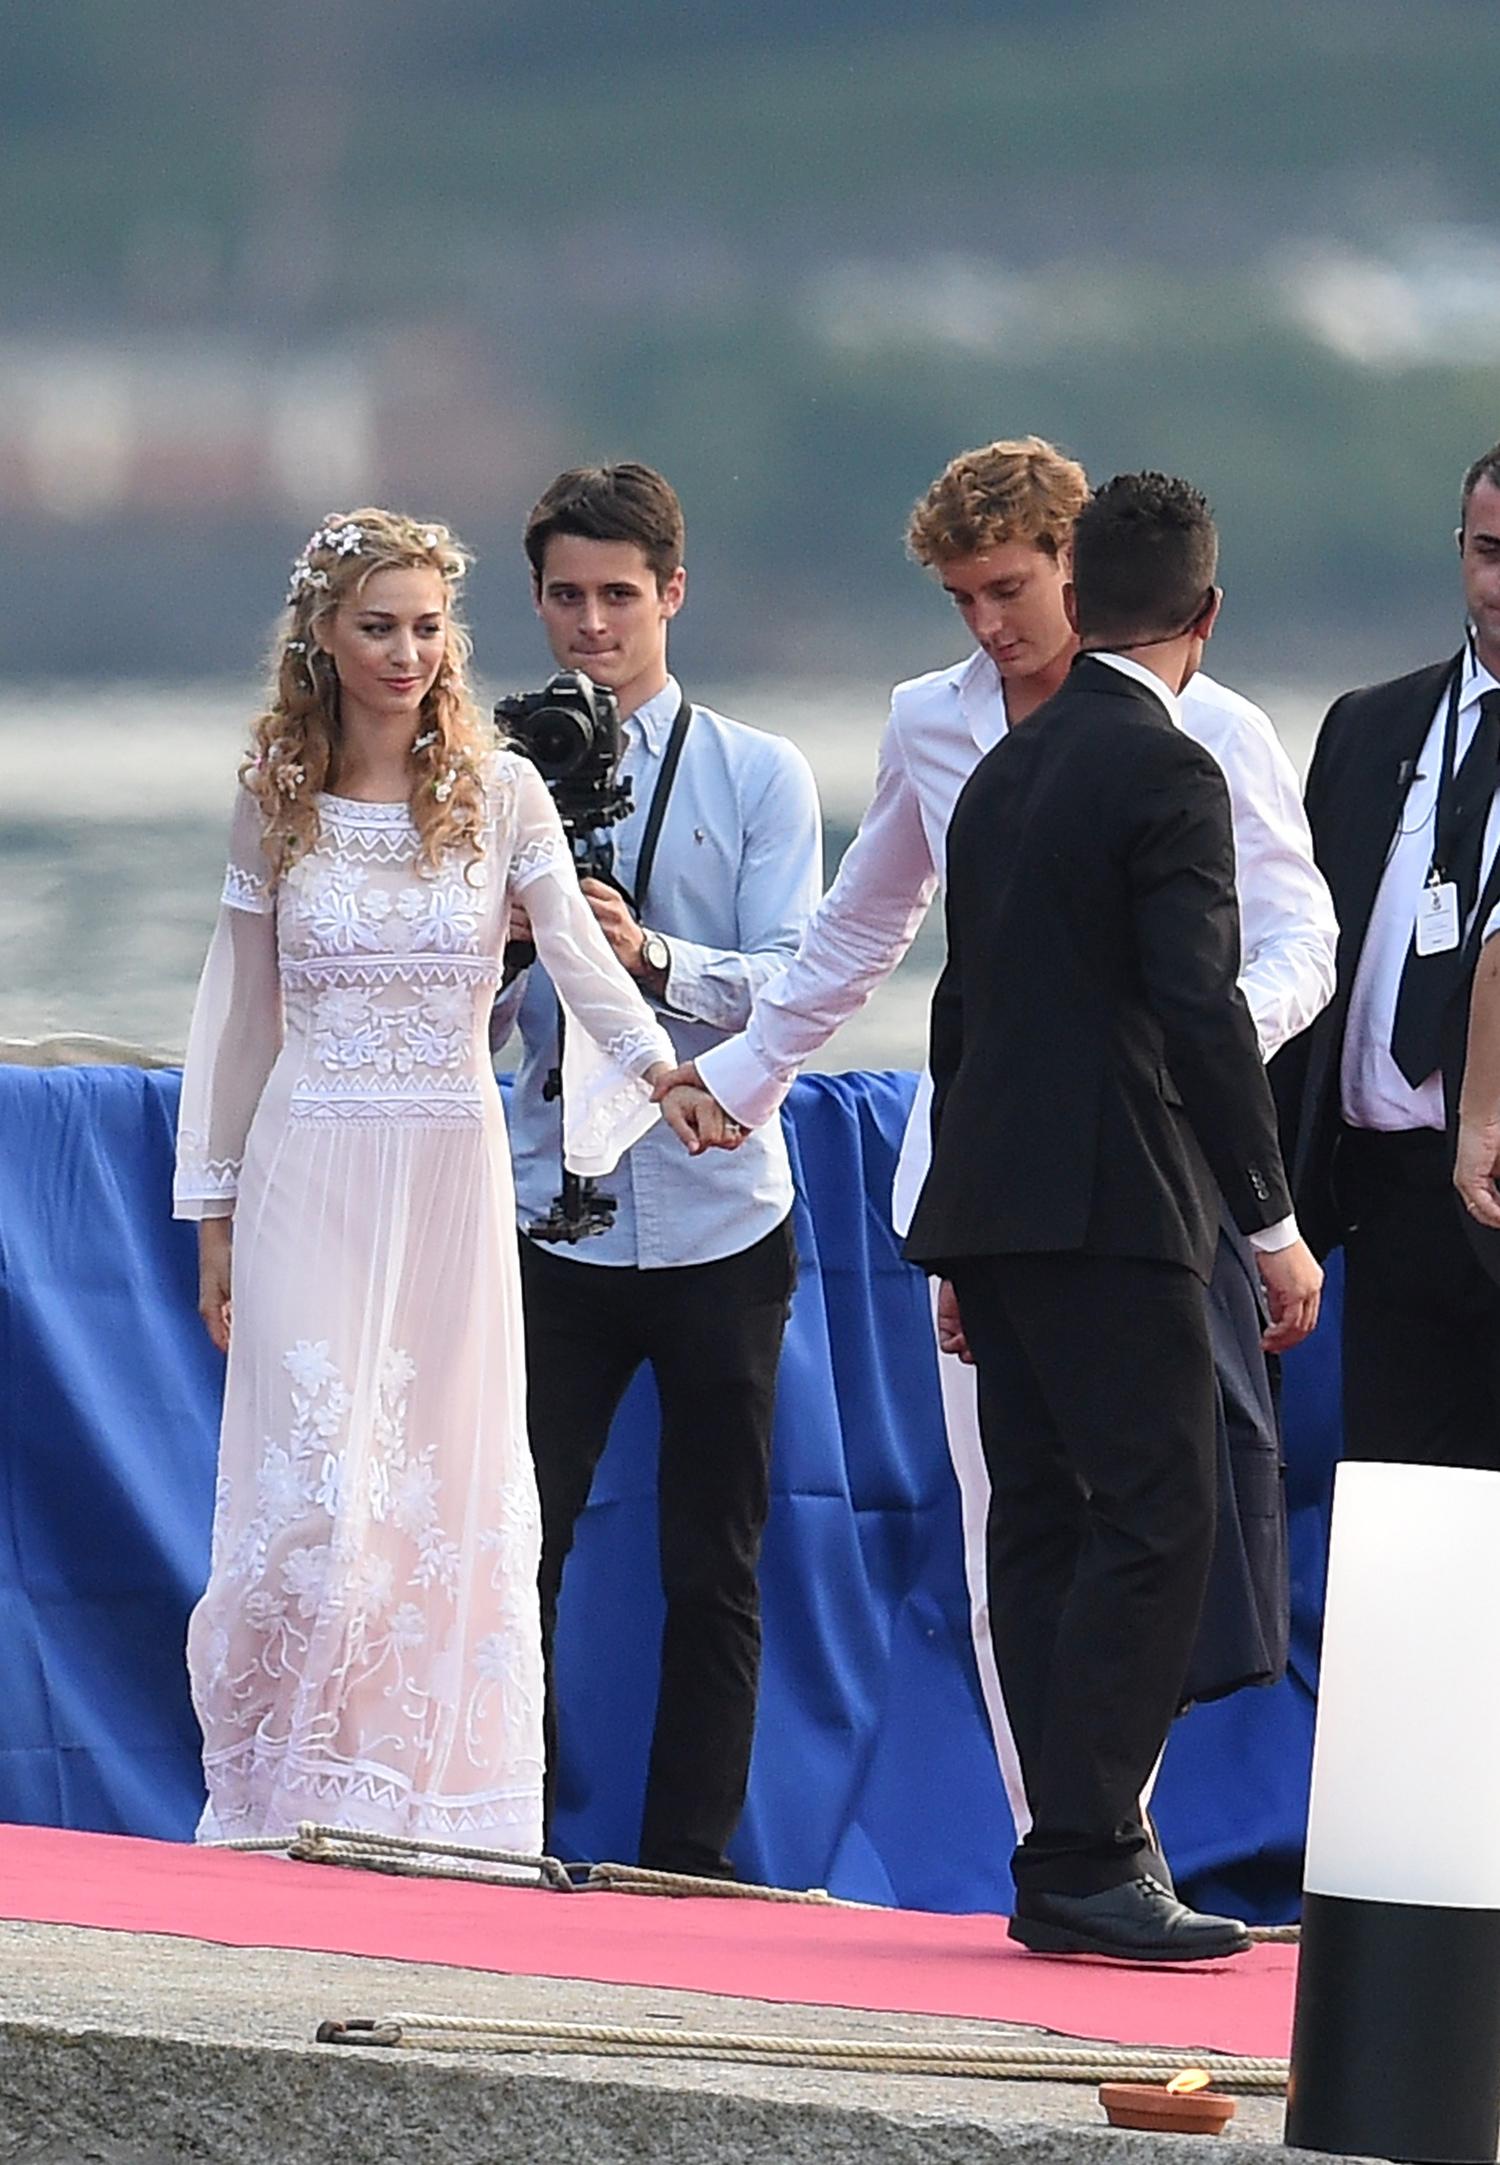 Mariage de Pierre Casiraghi et Beatrice Borromeo